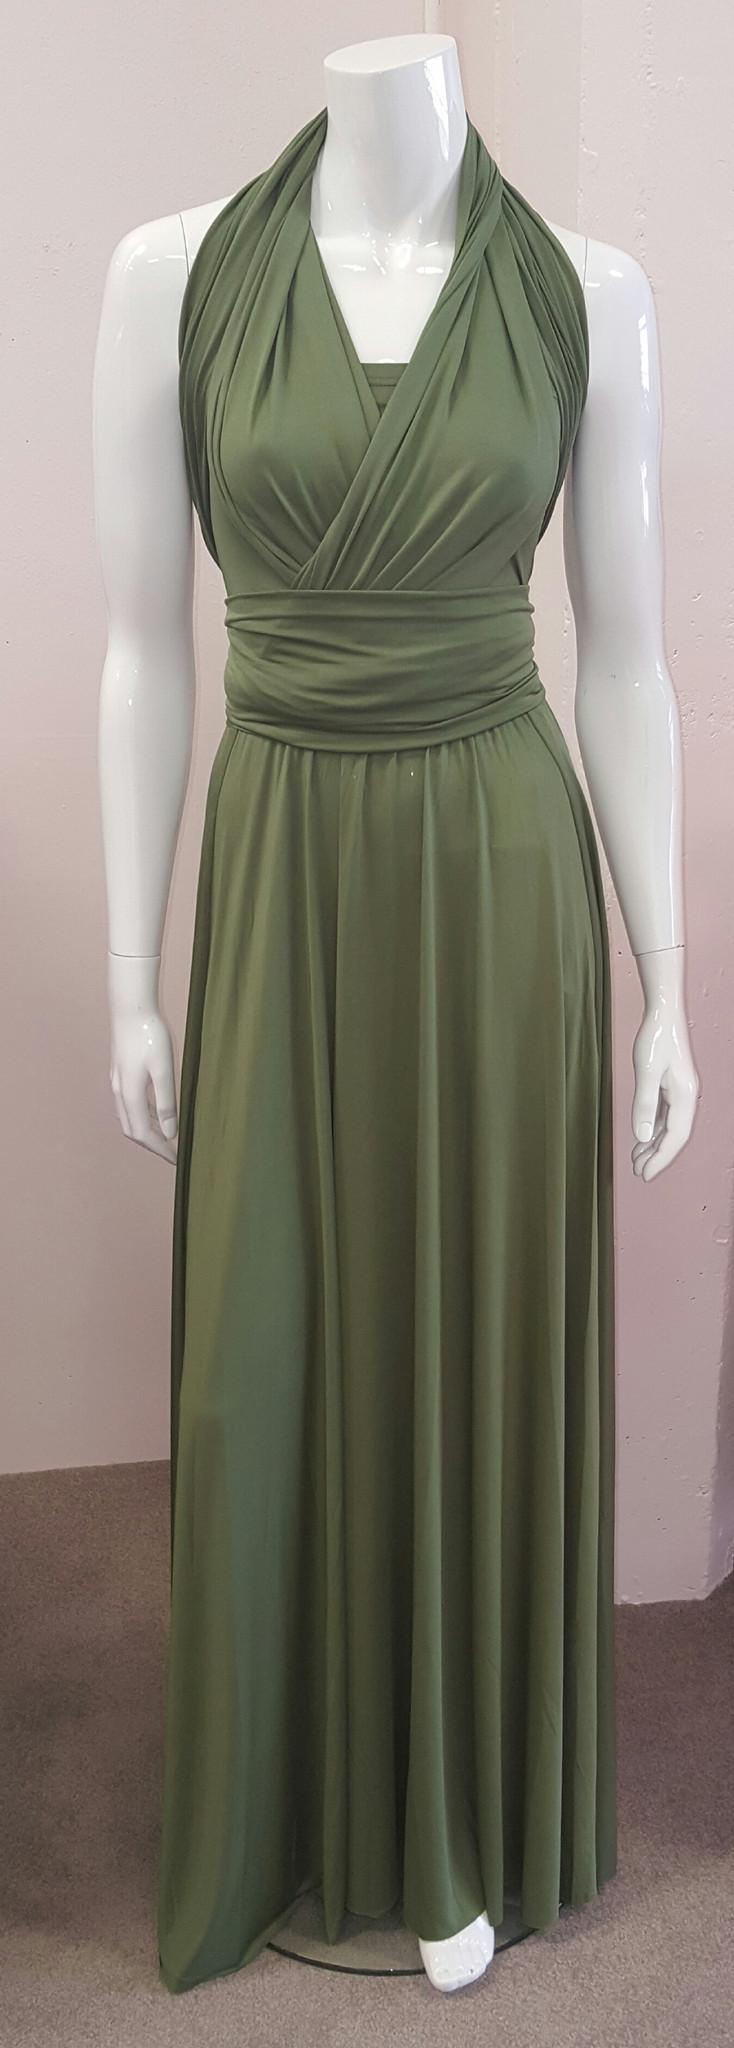 Olive Green Infinity Bridesmaid Dress